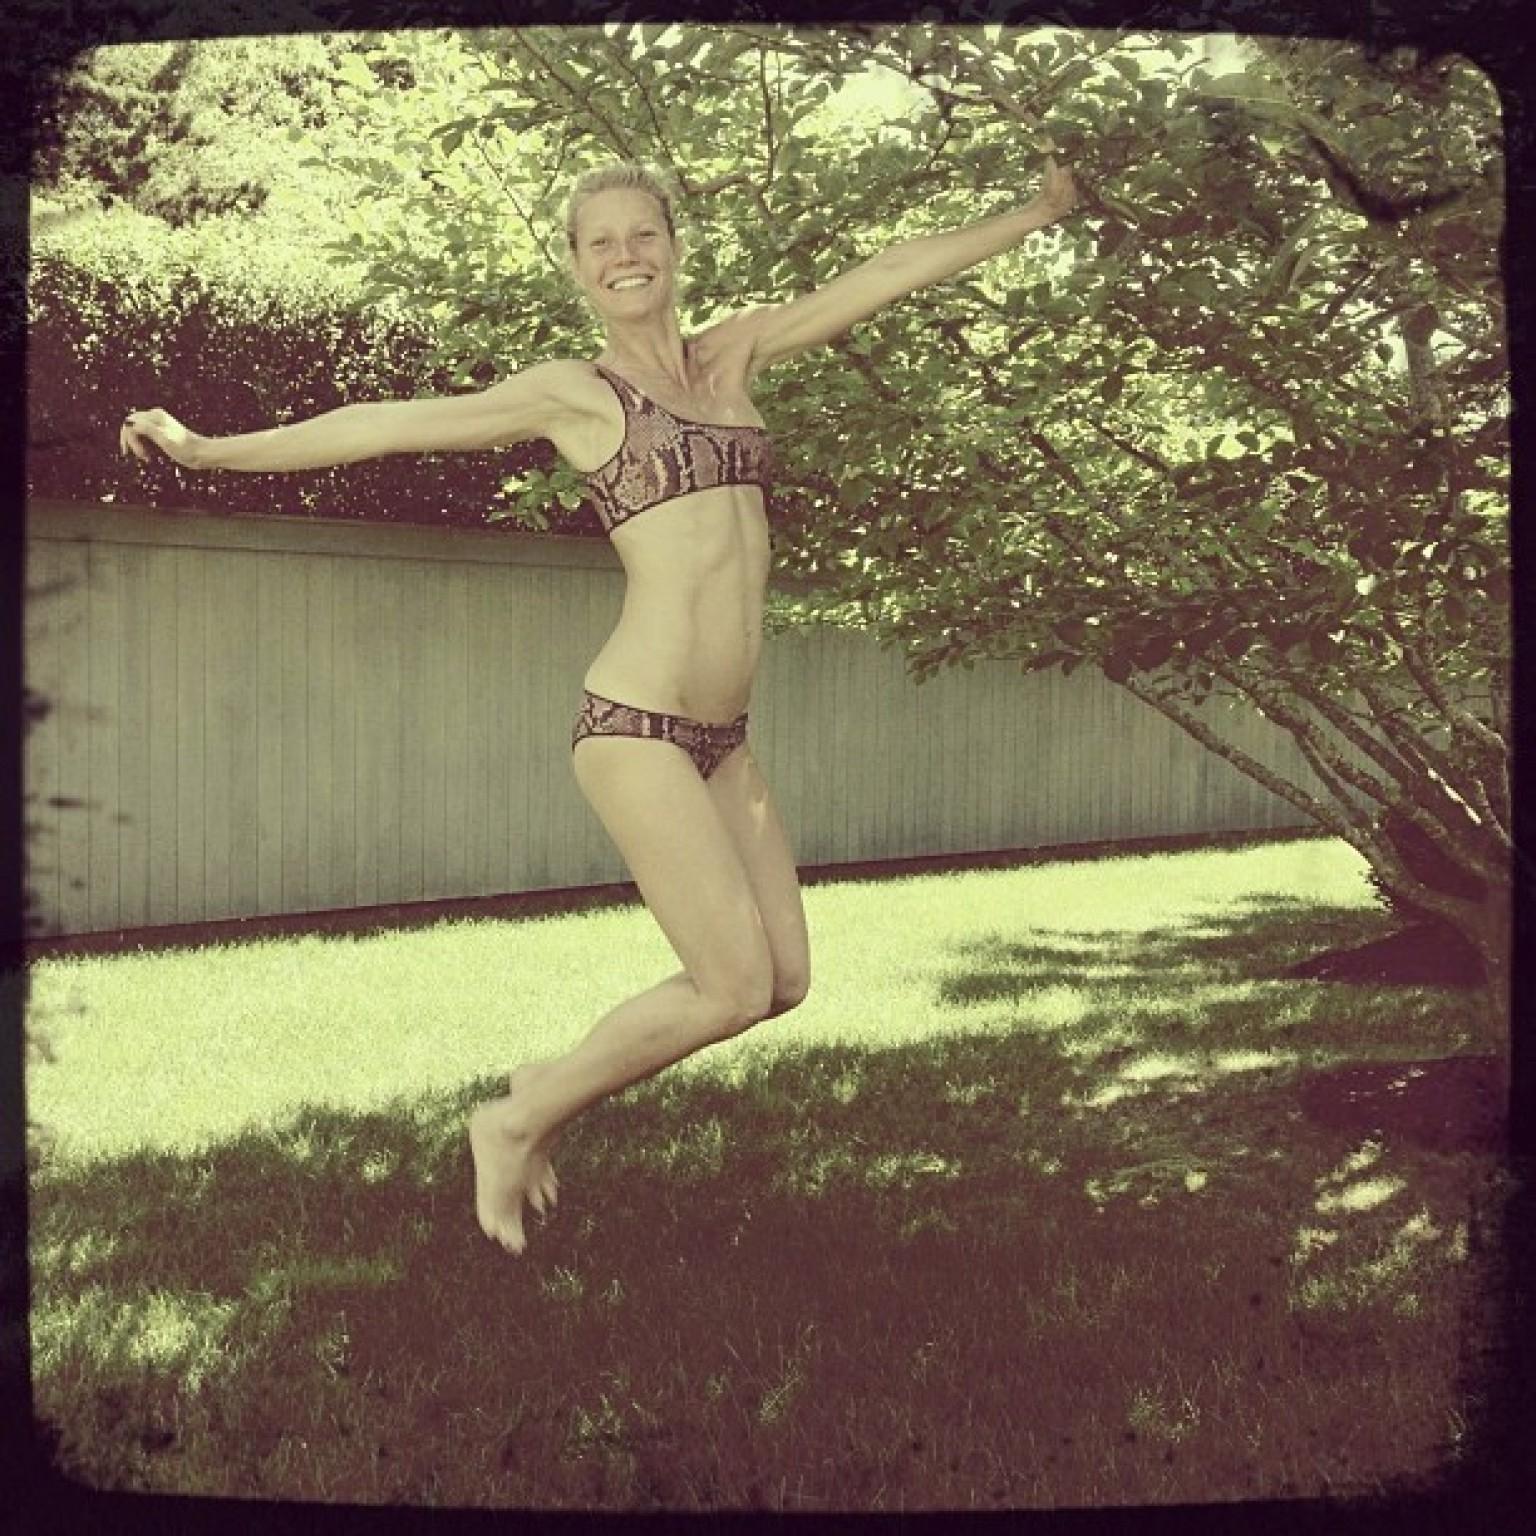 Teen planet jumping in bikinis